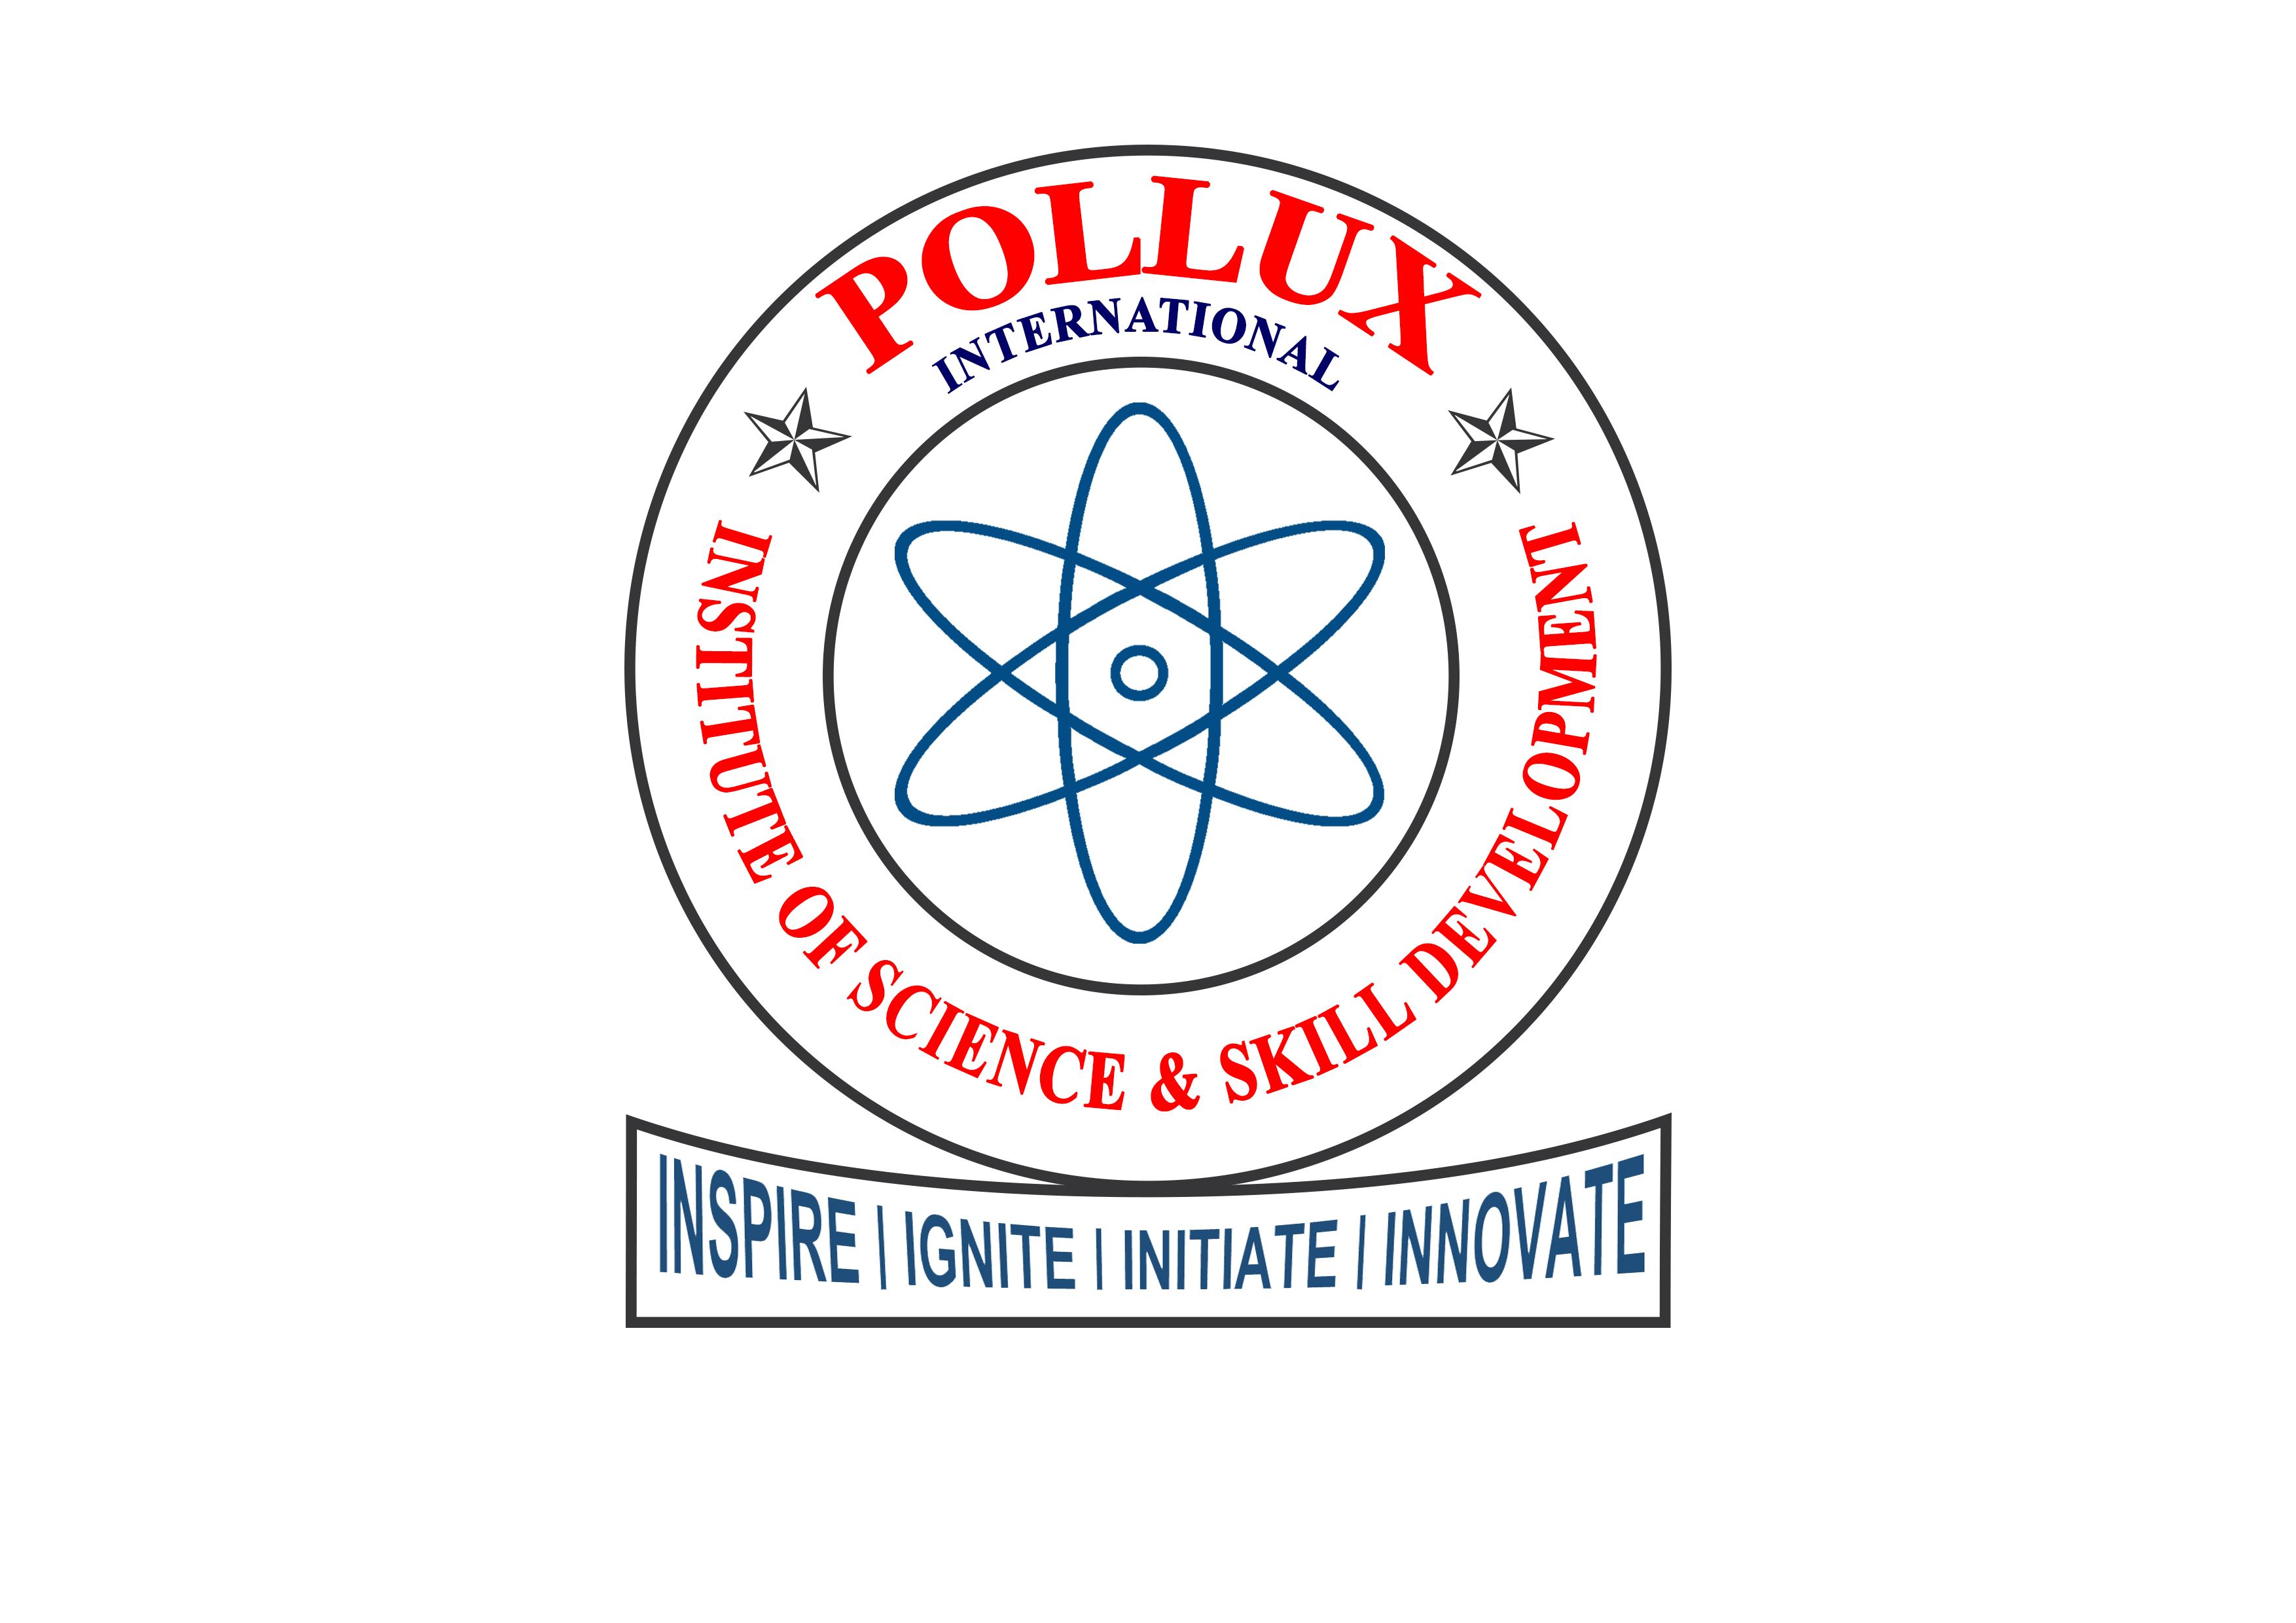 Pollux International institute